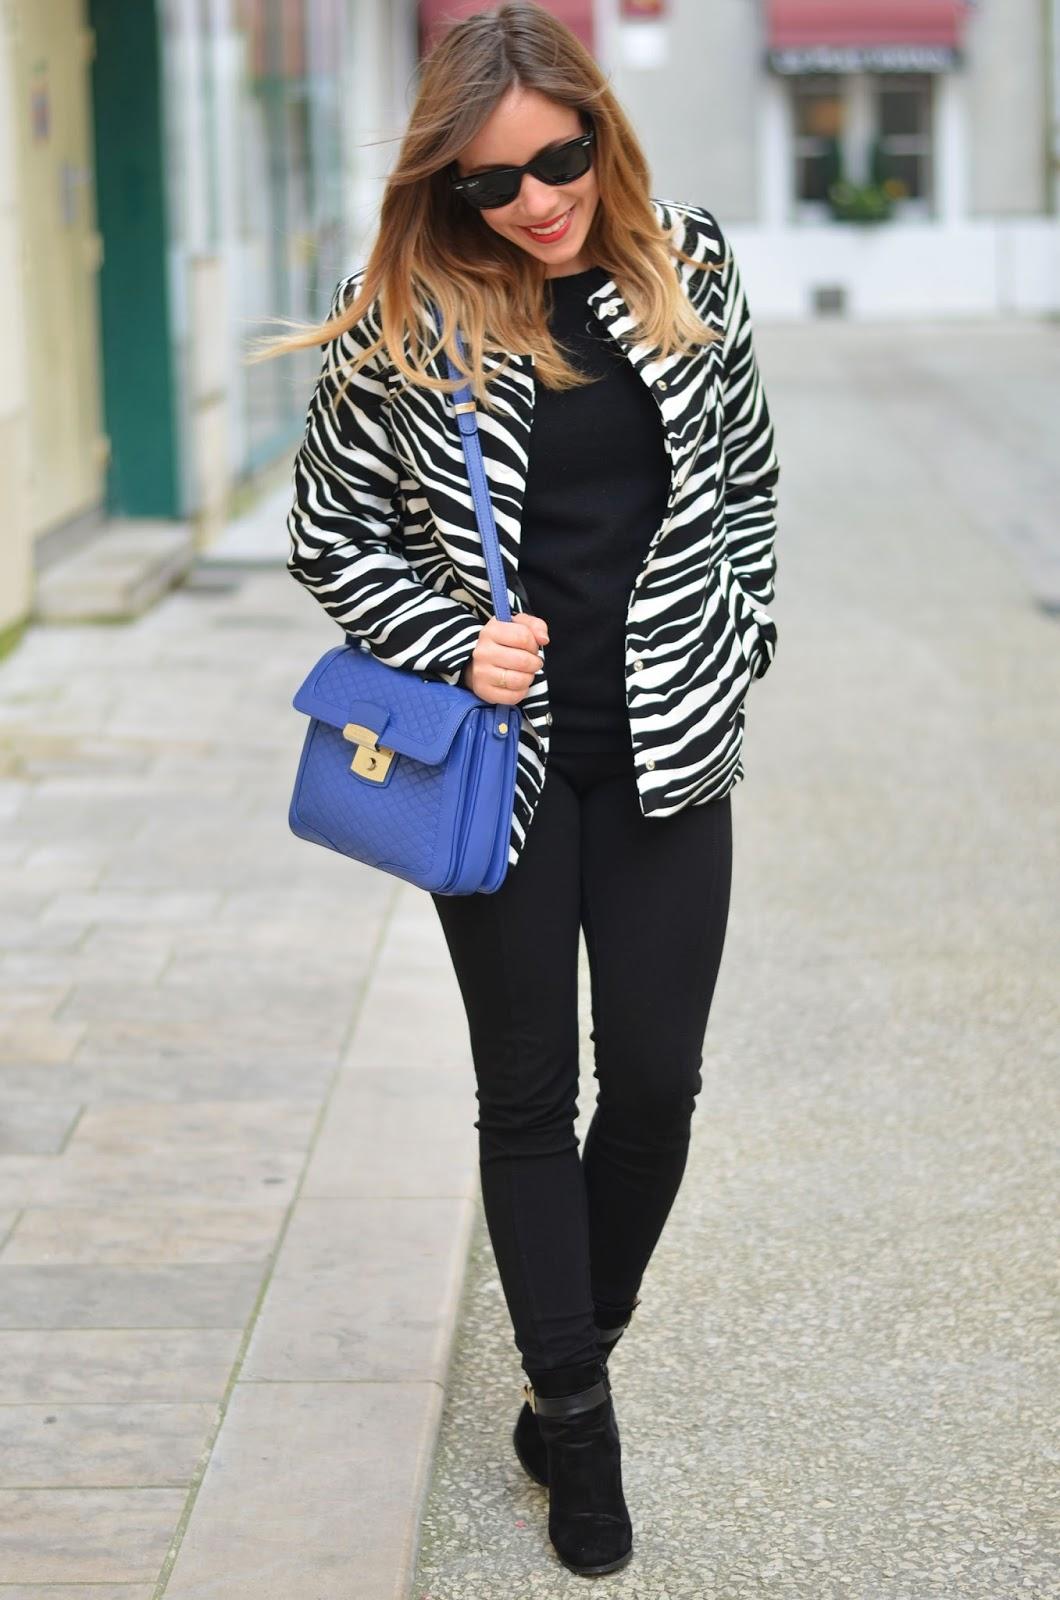 Manteau rayures zébre